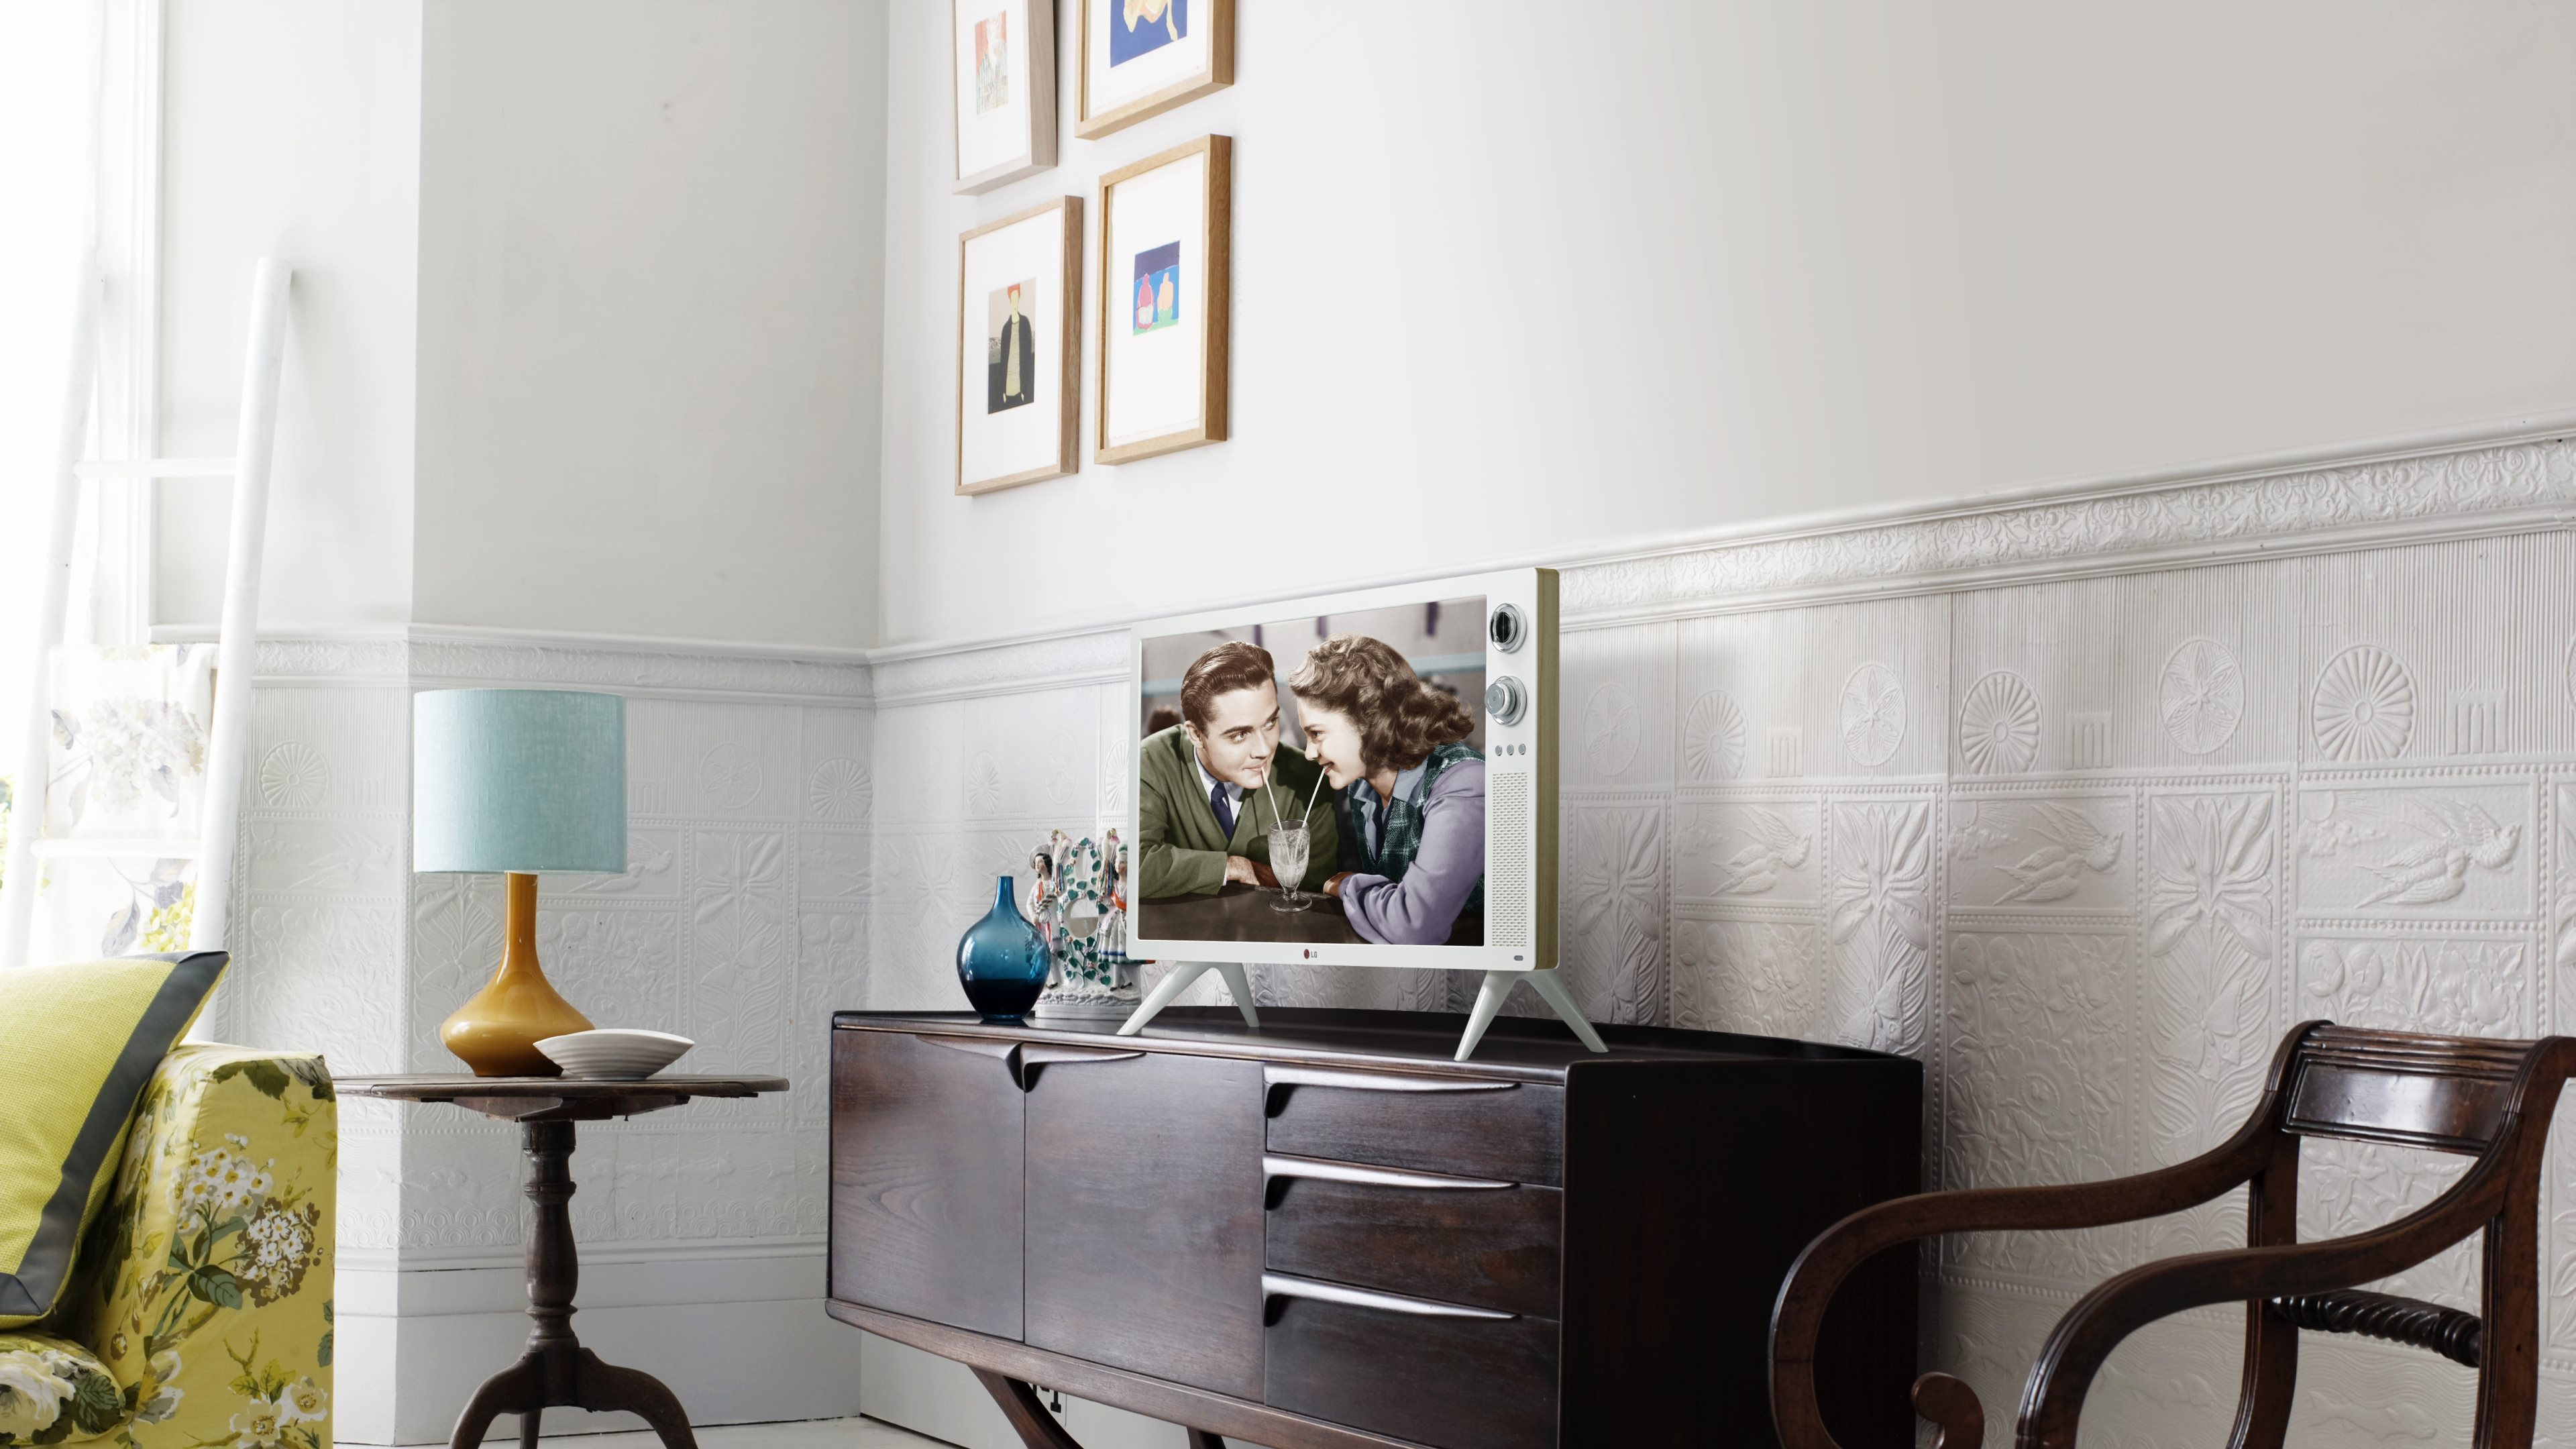 Lg electronics interior design hd wallpapers 4k for Interior designs hd